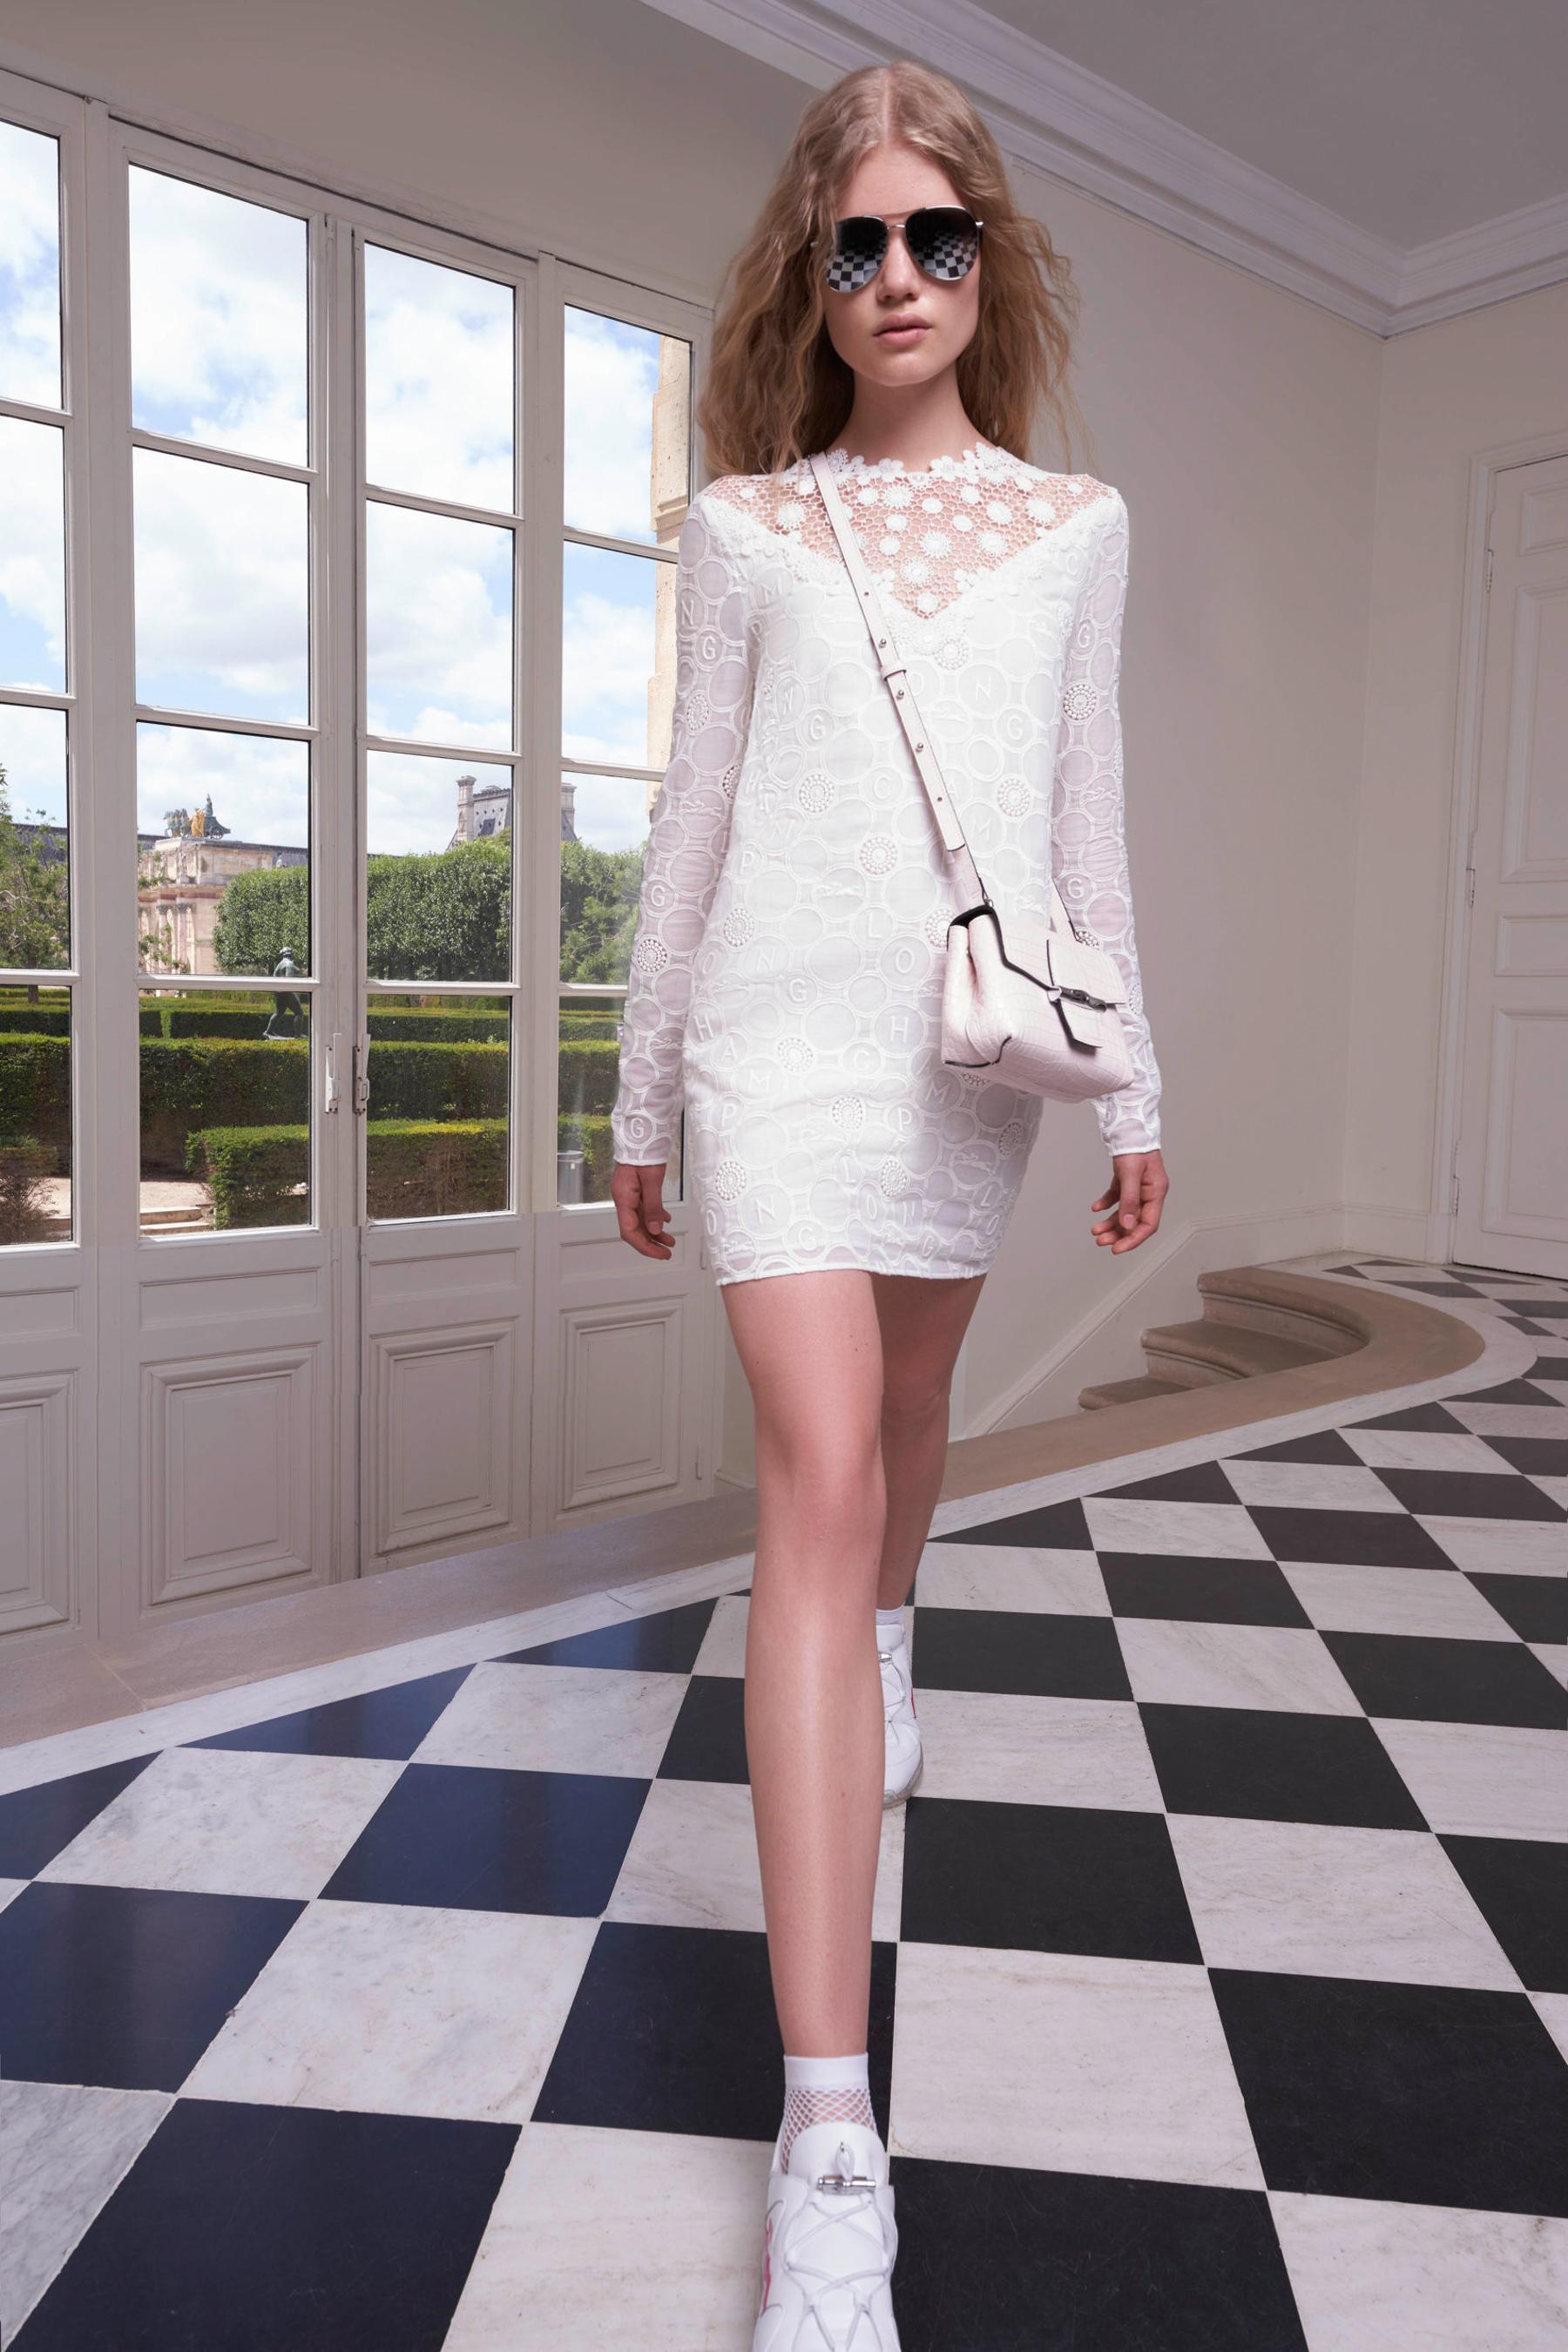 Longchamp Spring 2021 Fashion Show Photos